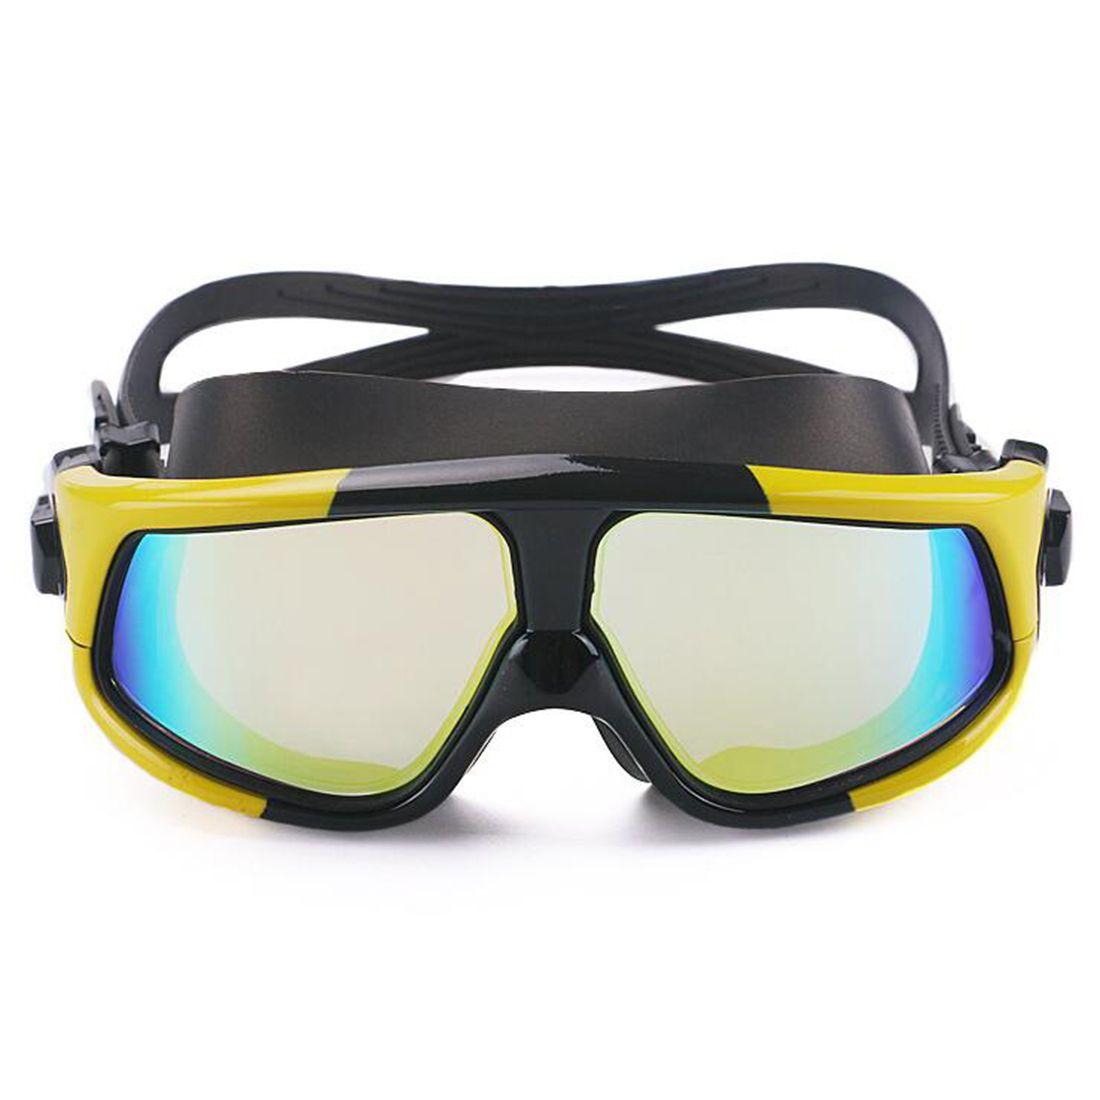 4207d33f251 2018 Comfortable Silicone Large Frame Swim Glasses Swimming Goggles ...